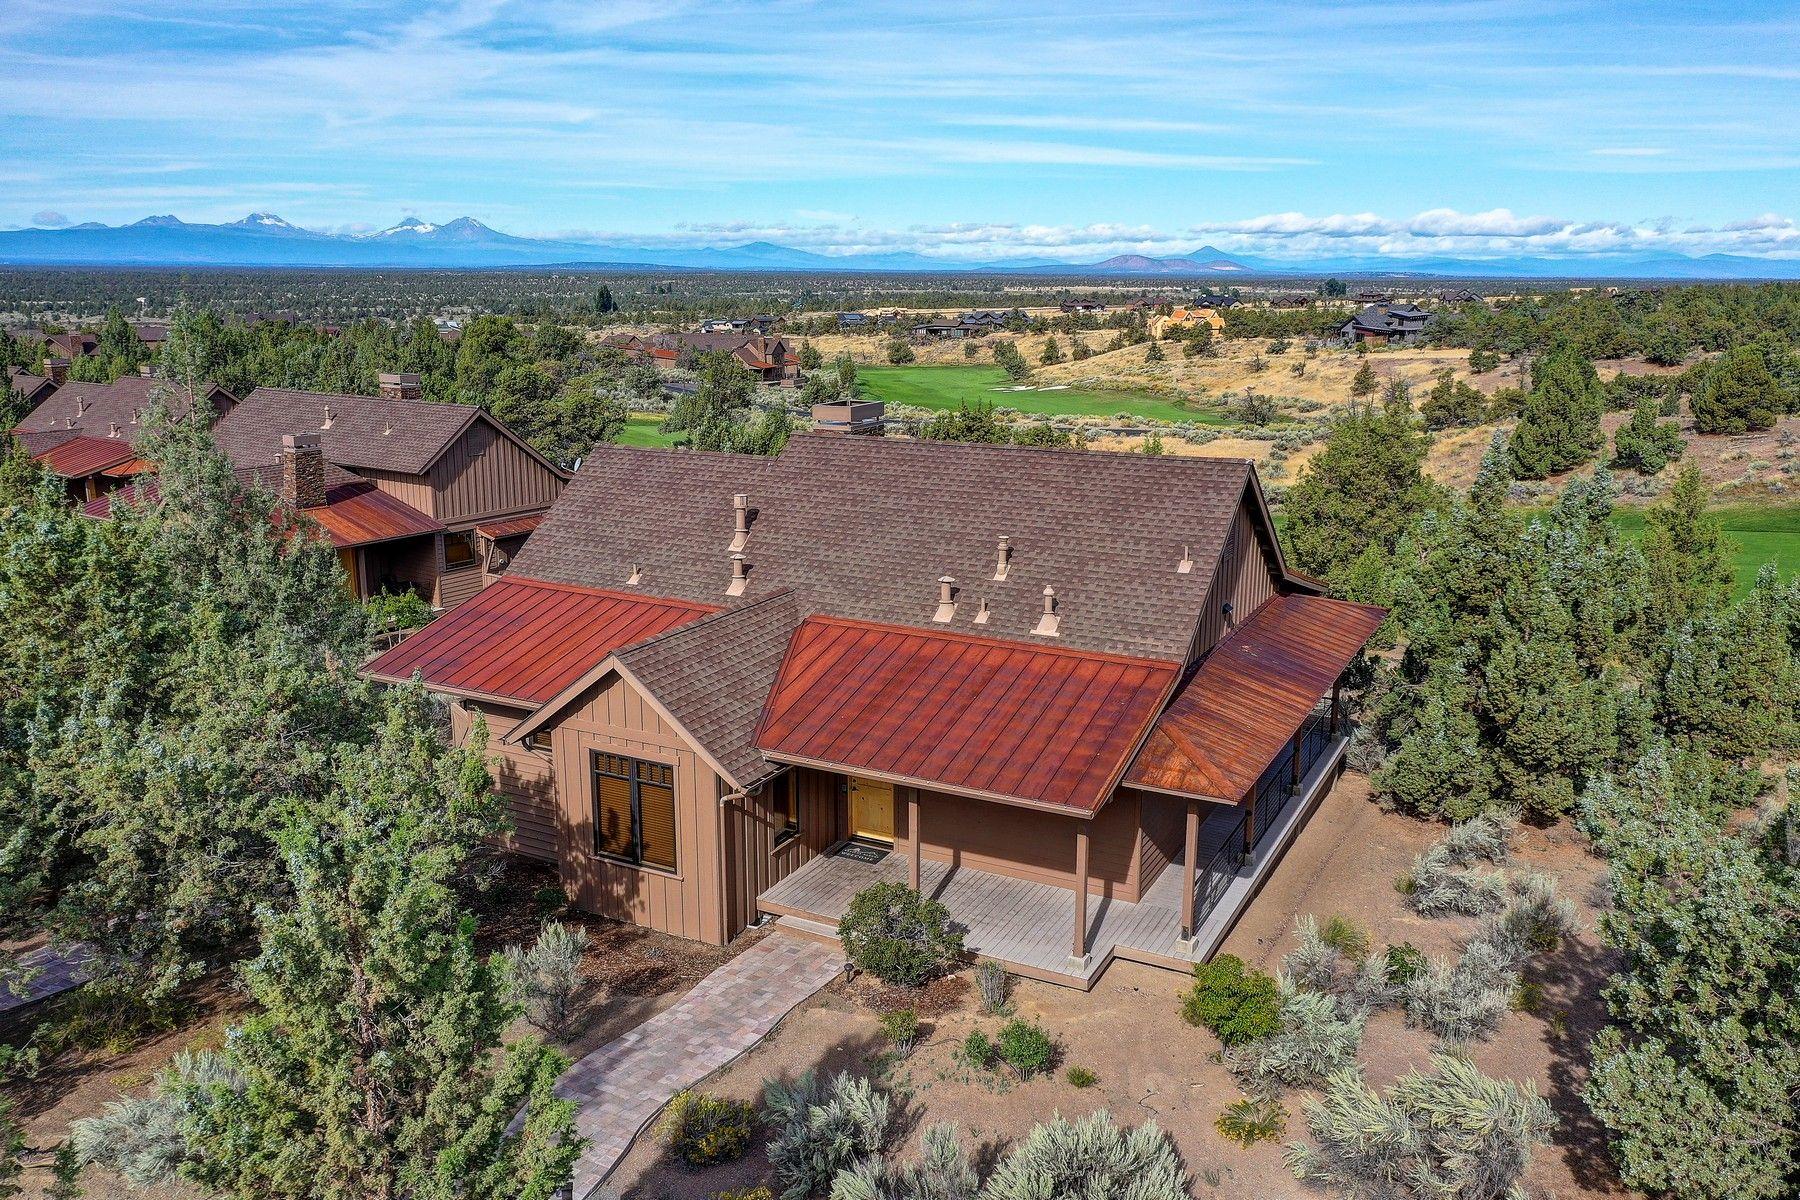 Other Residential Homes για την Πώληση στο 16743 SW Brasada Ranch Road Cabin 61 Powell Butte, OR 97753 Powell Butte, Ορεγκον 97753 Ηνωμένες Πολιτείες